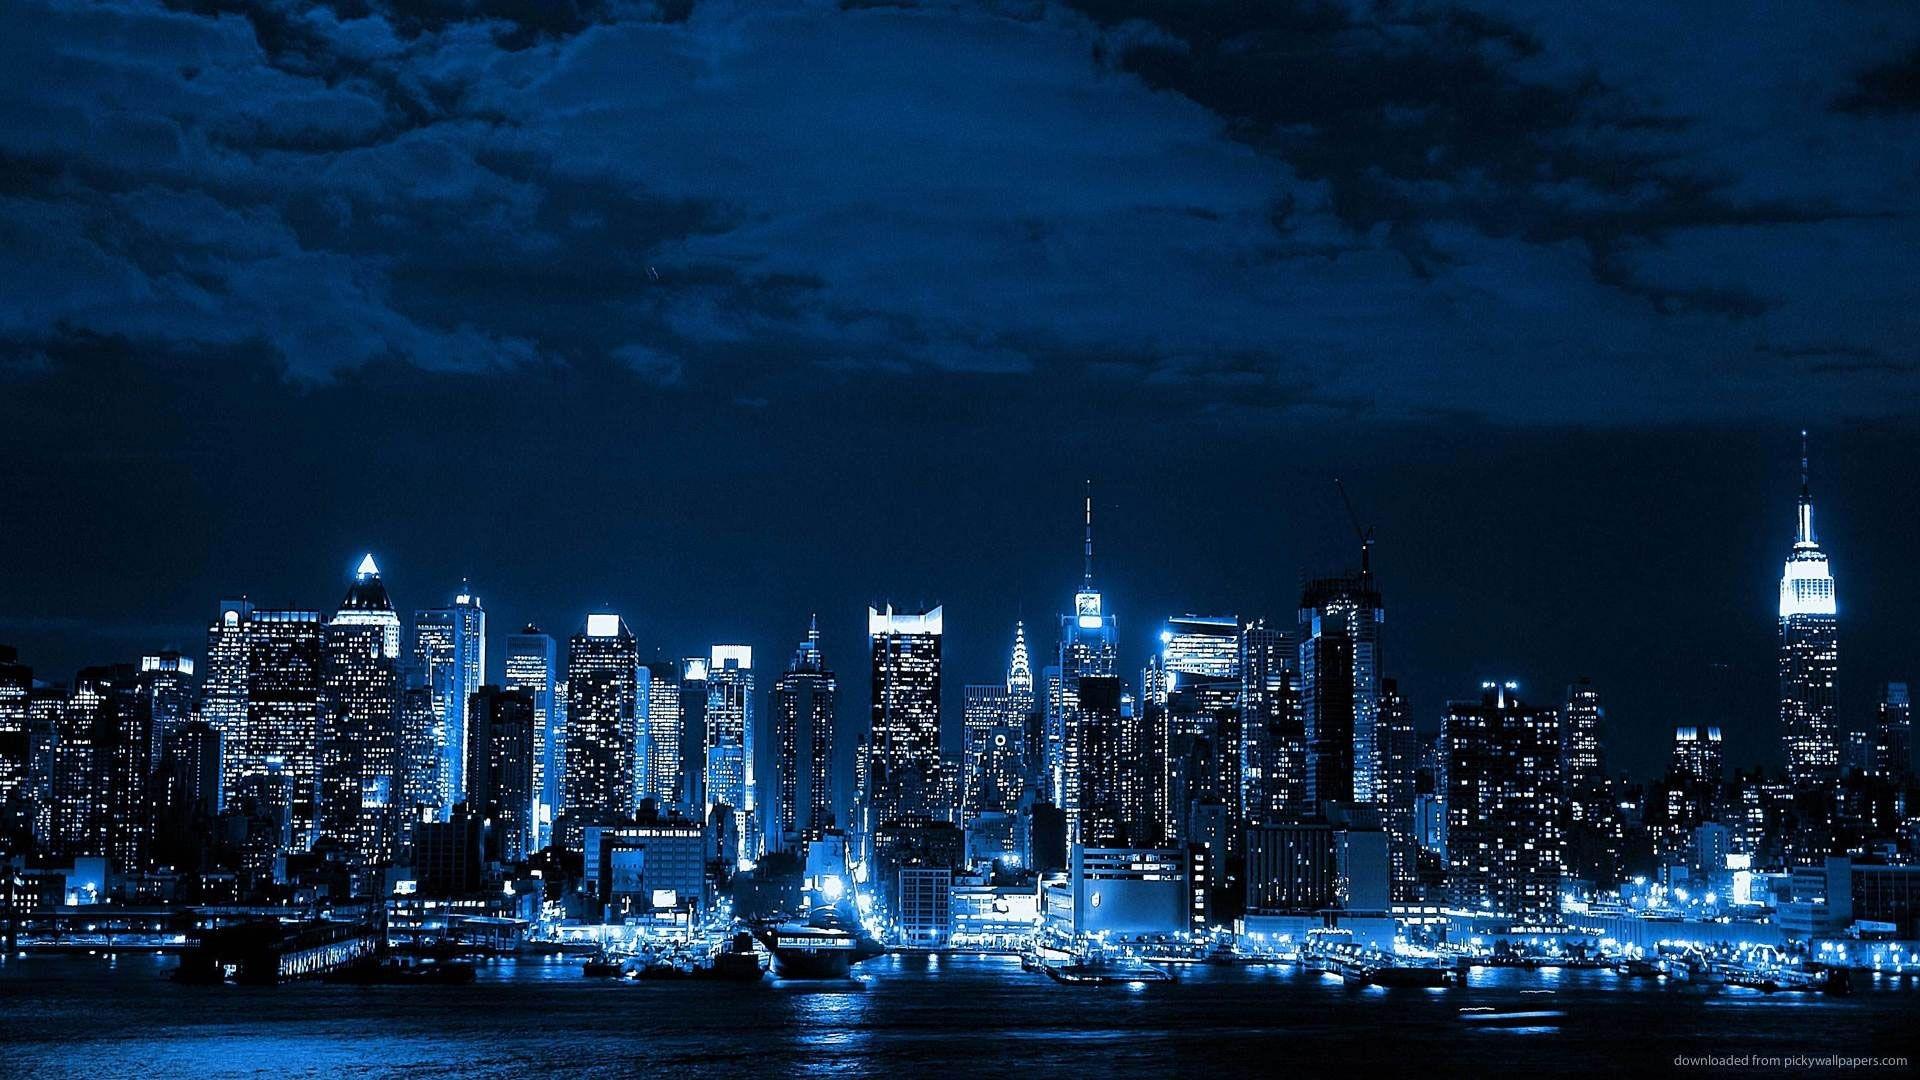 hd pics photos blue neon city desktop background wallpaper   only hd